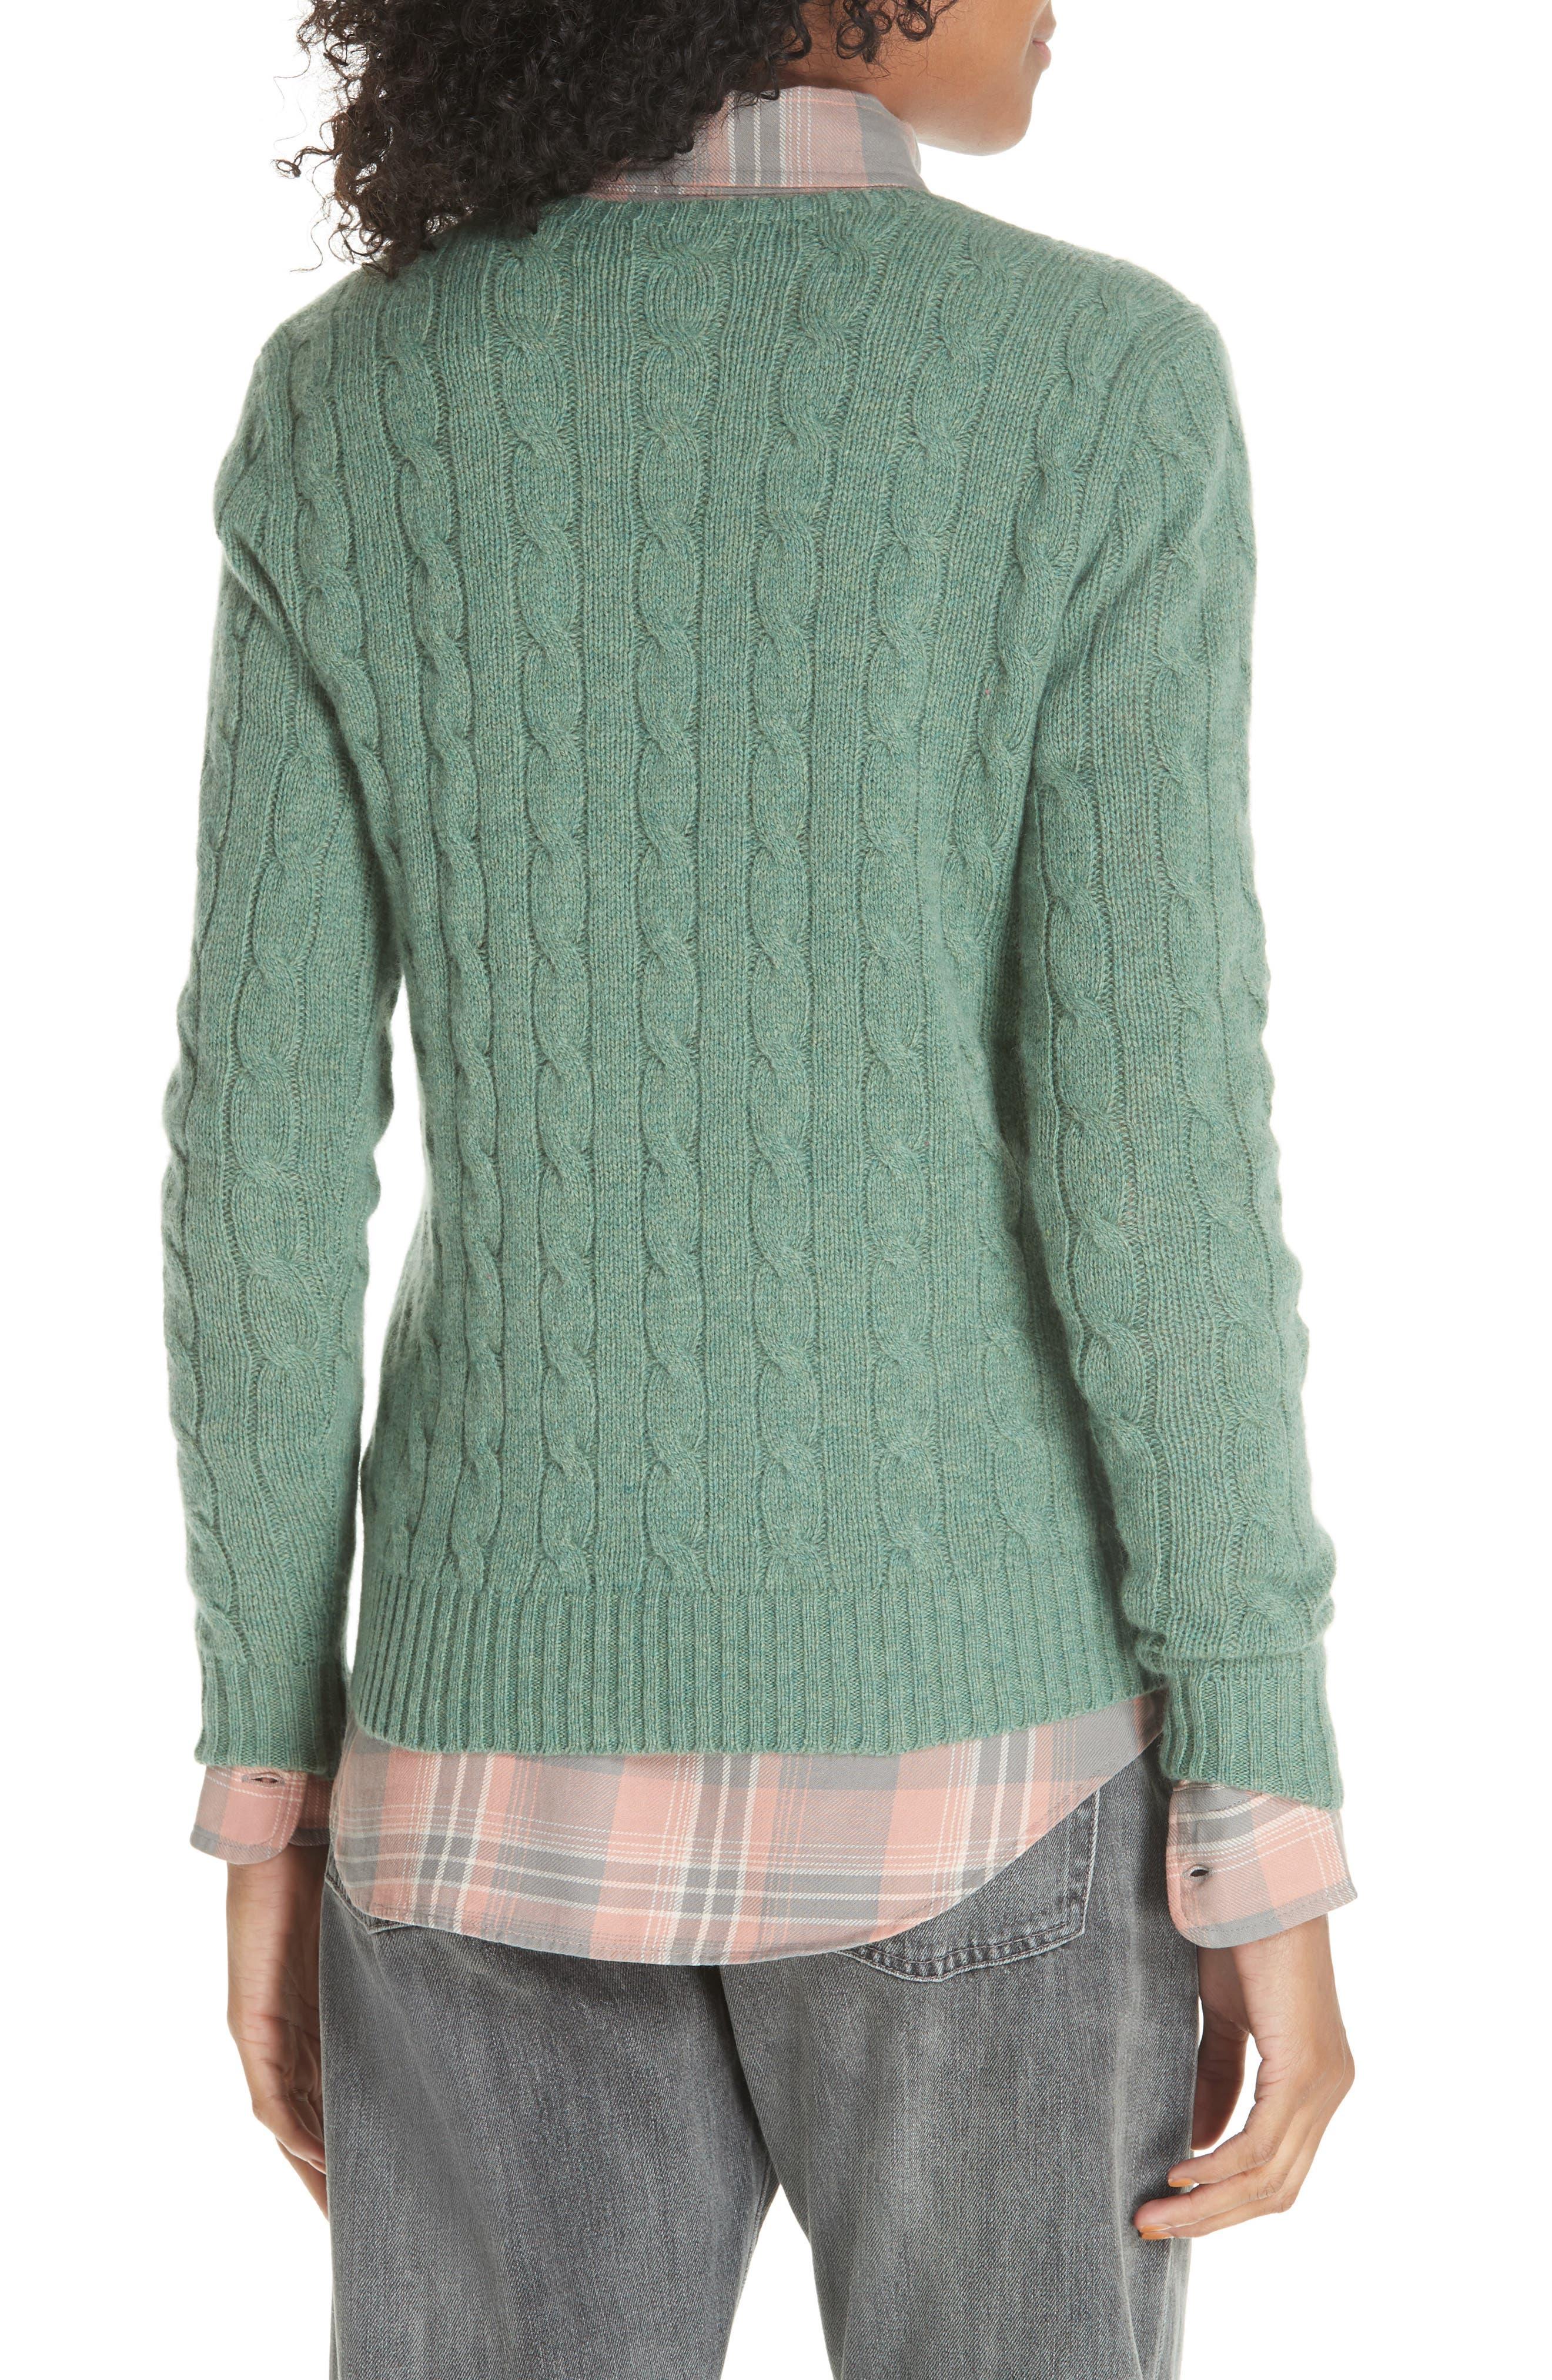 POLO RALPH LAUREN, Cable Knit Cotton Sweater, Alternate thumbnail 2, color, 300